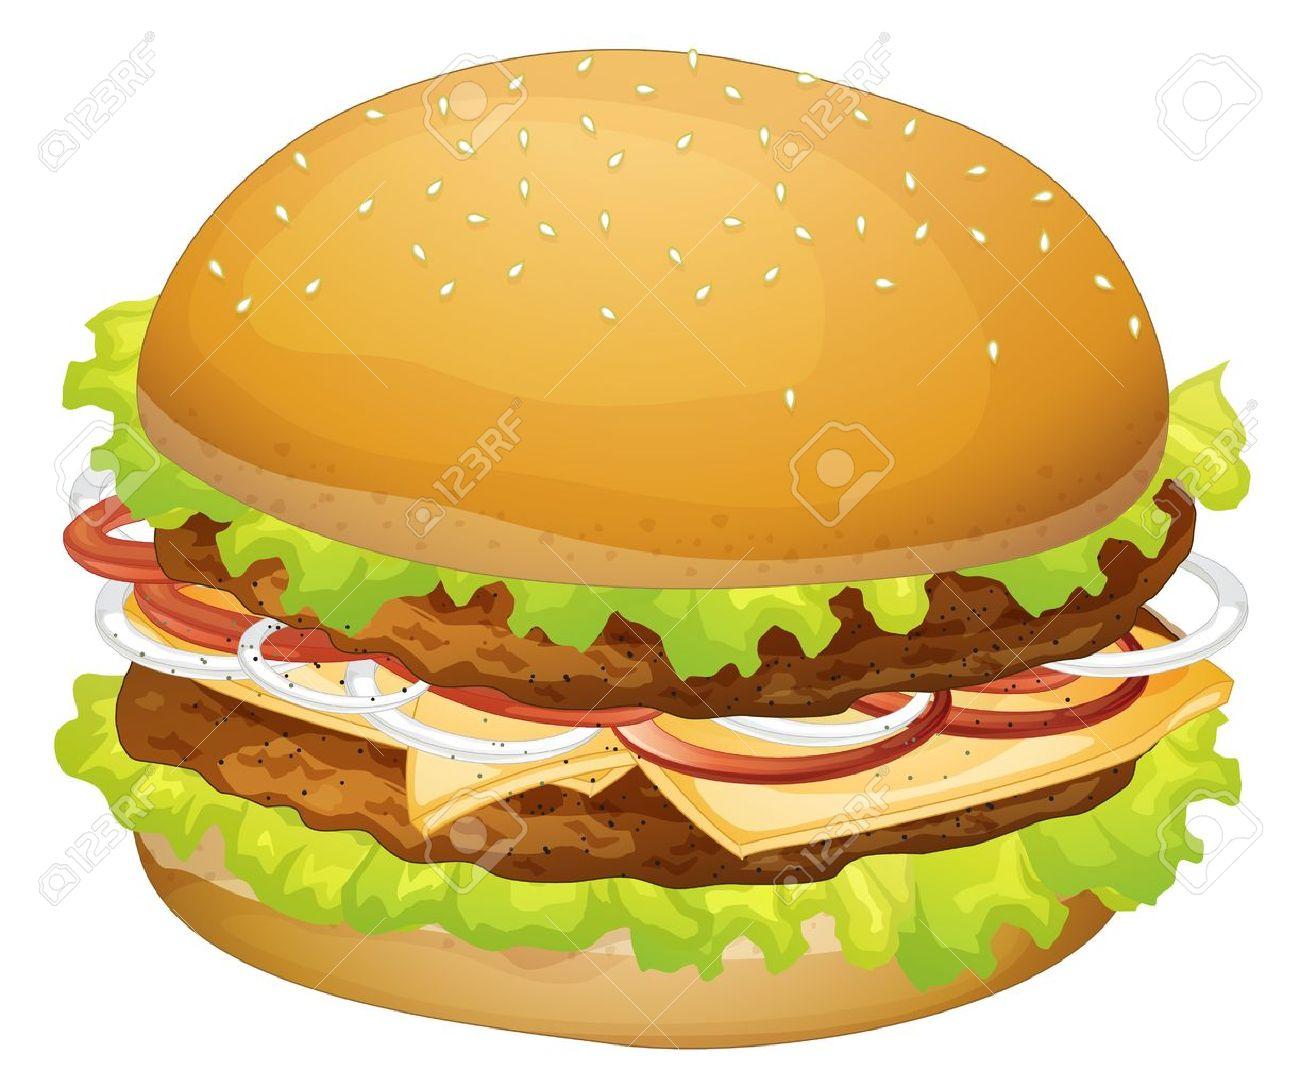 burger clipartlook. Cheeseburger clipart burge